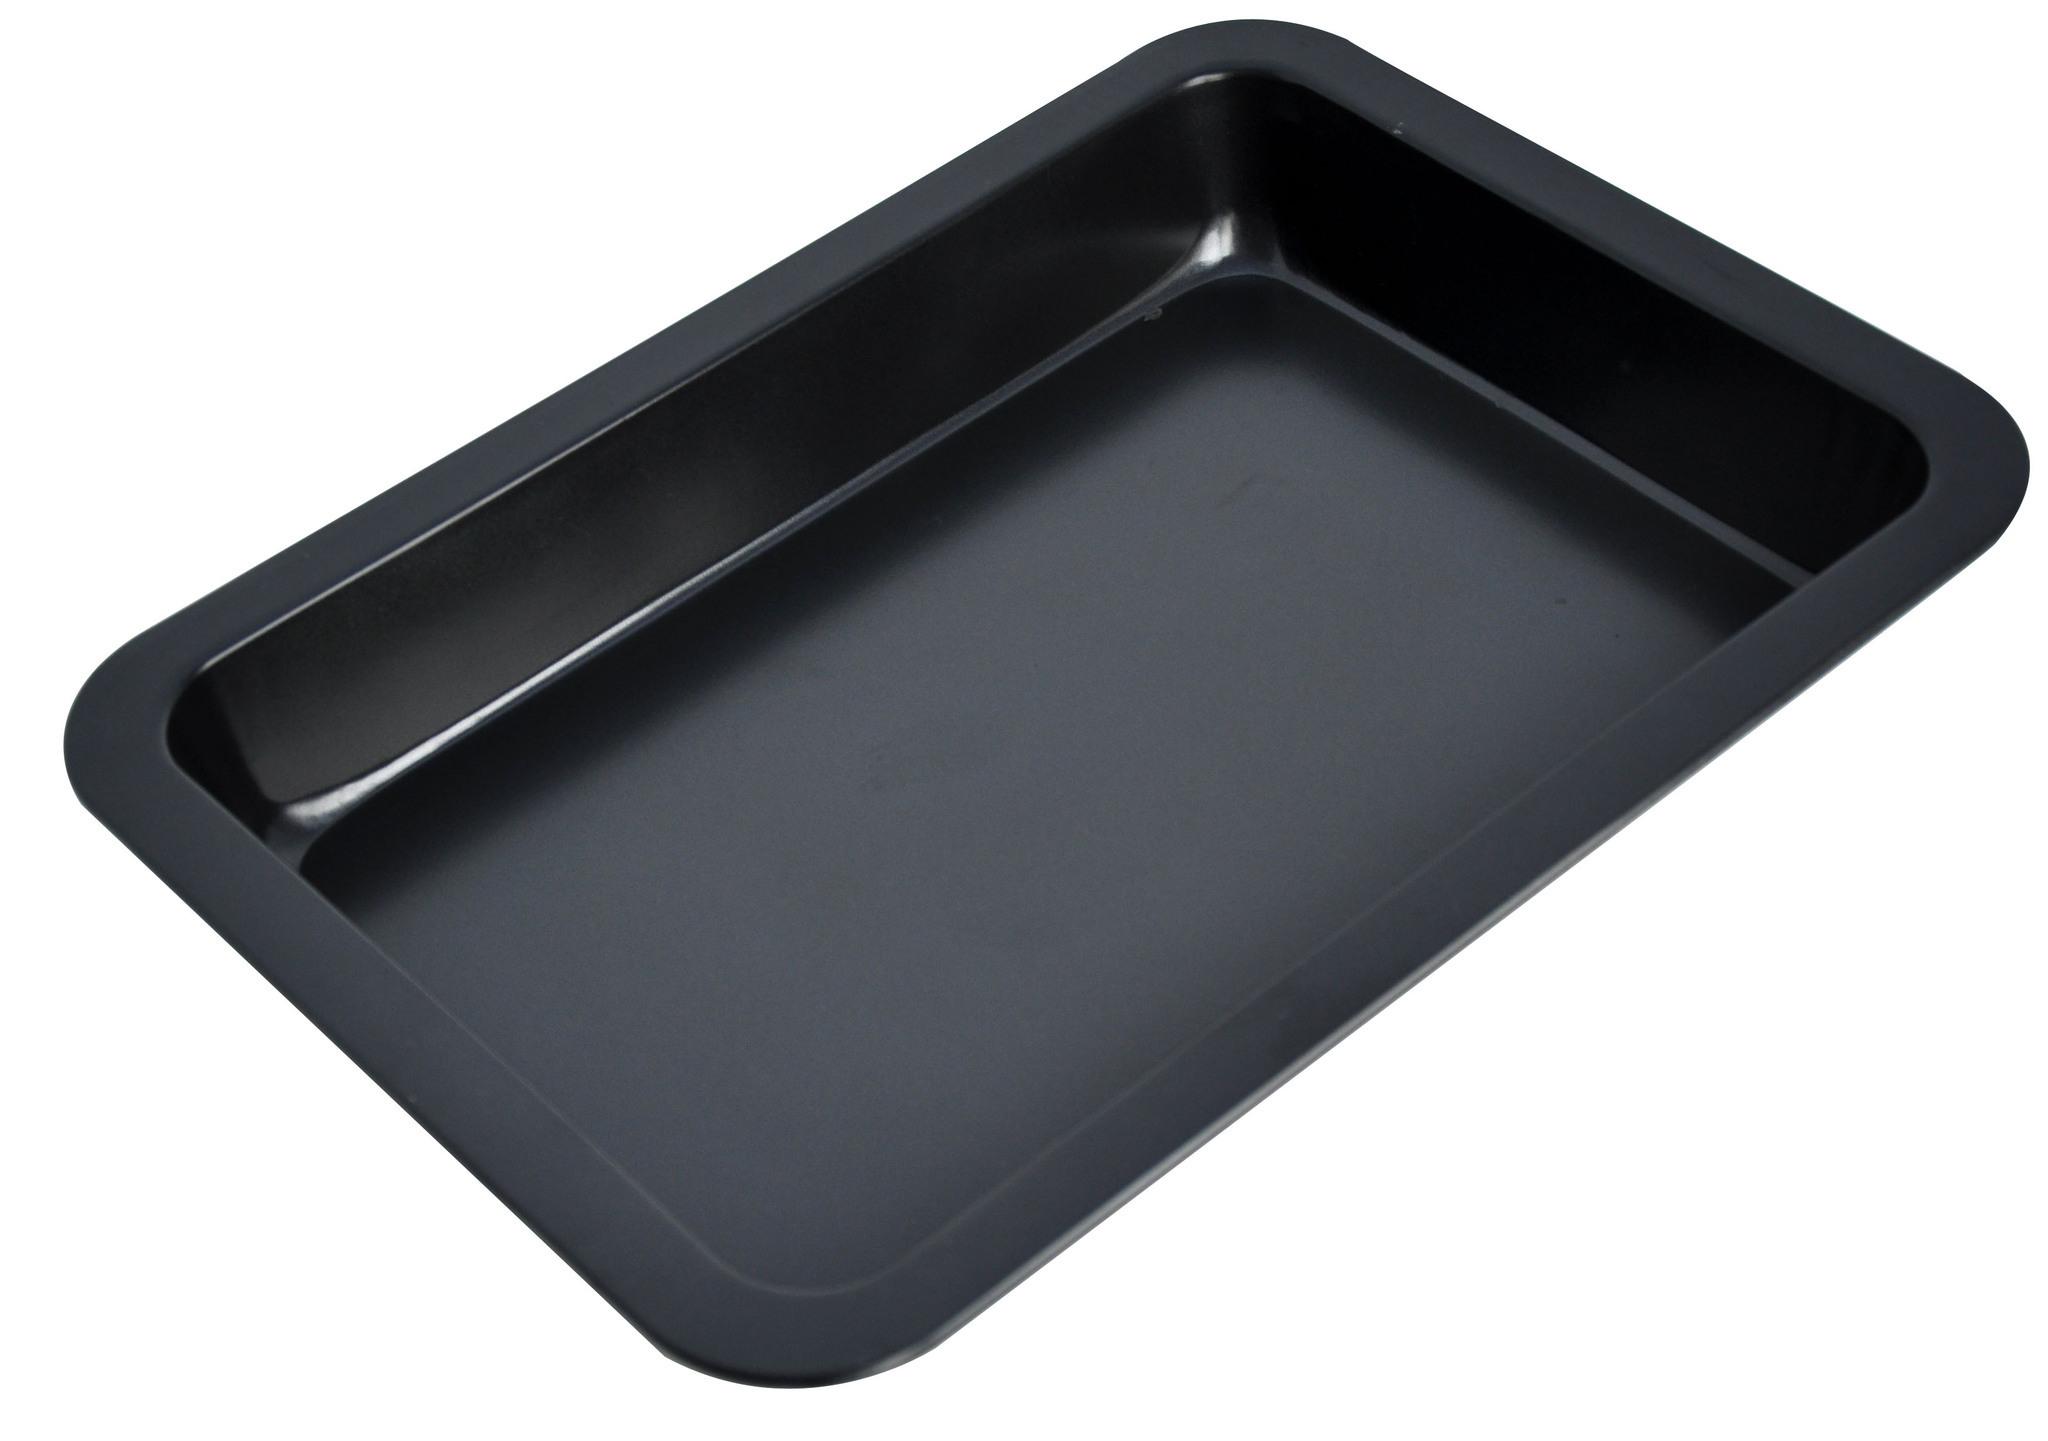 Противень Regent inoxВсе для выпечки<br>Тип: противень,<br>Материал: сталь,<br>Размер противня: 420x320x50мм<br>